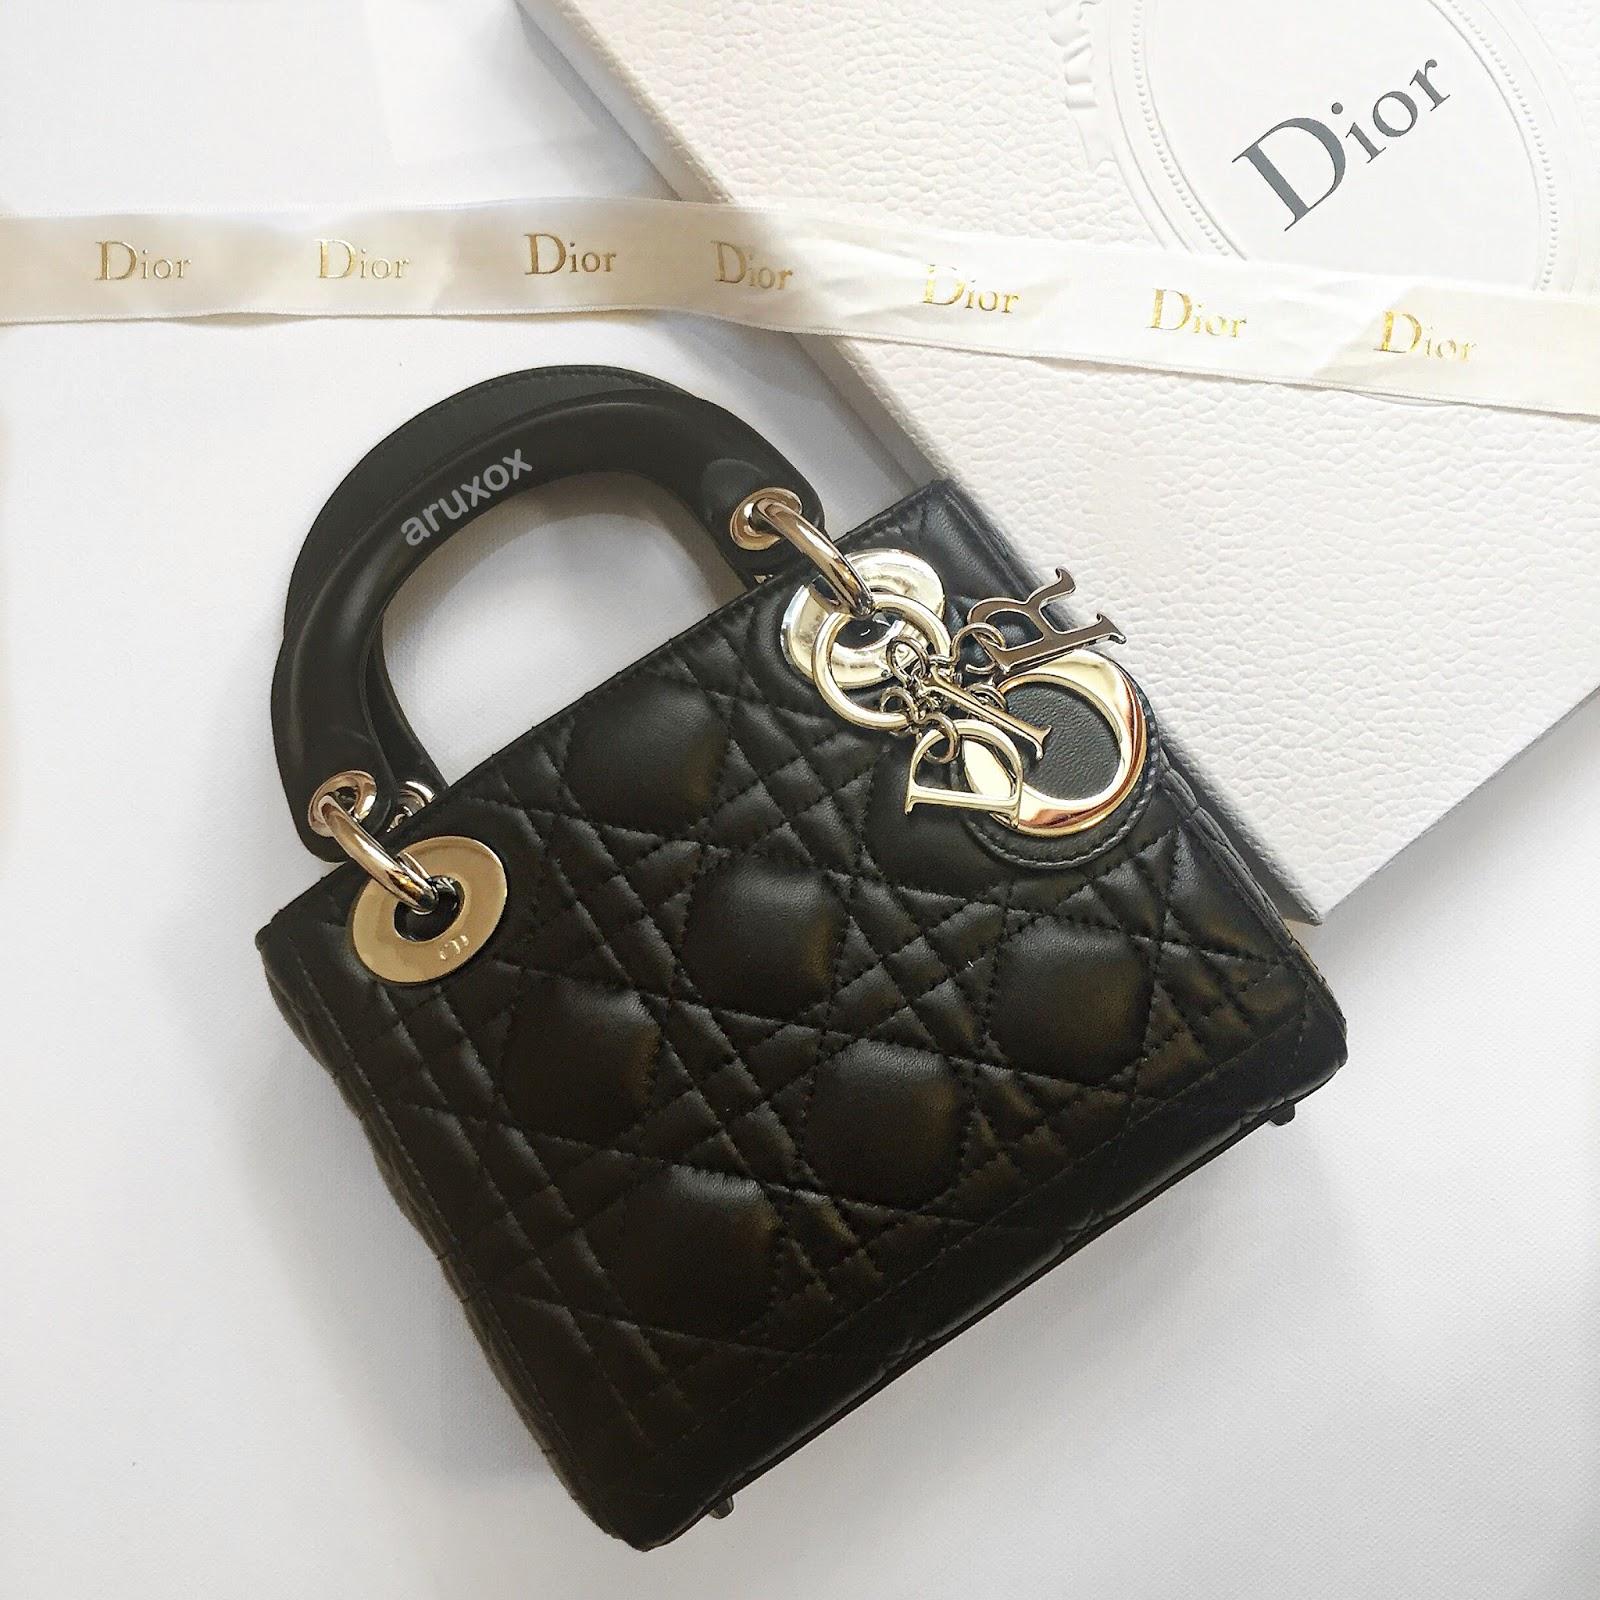 5eba808f84c Lady Dior Mini | Eesha's Glam